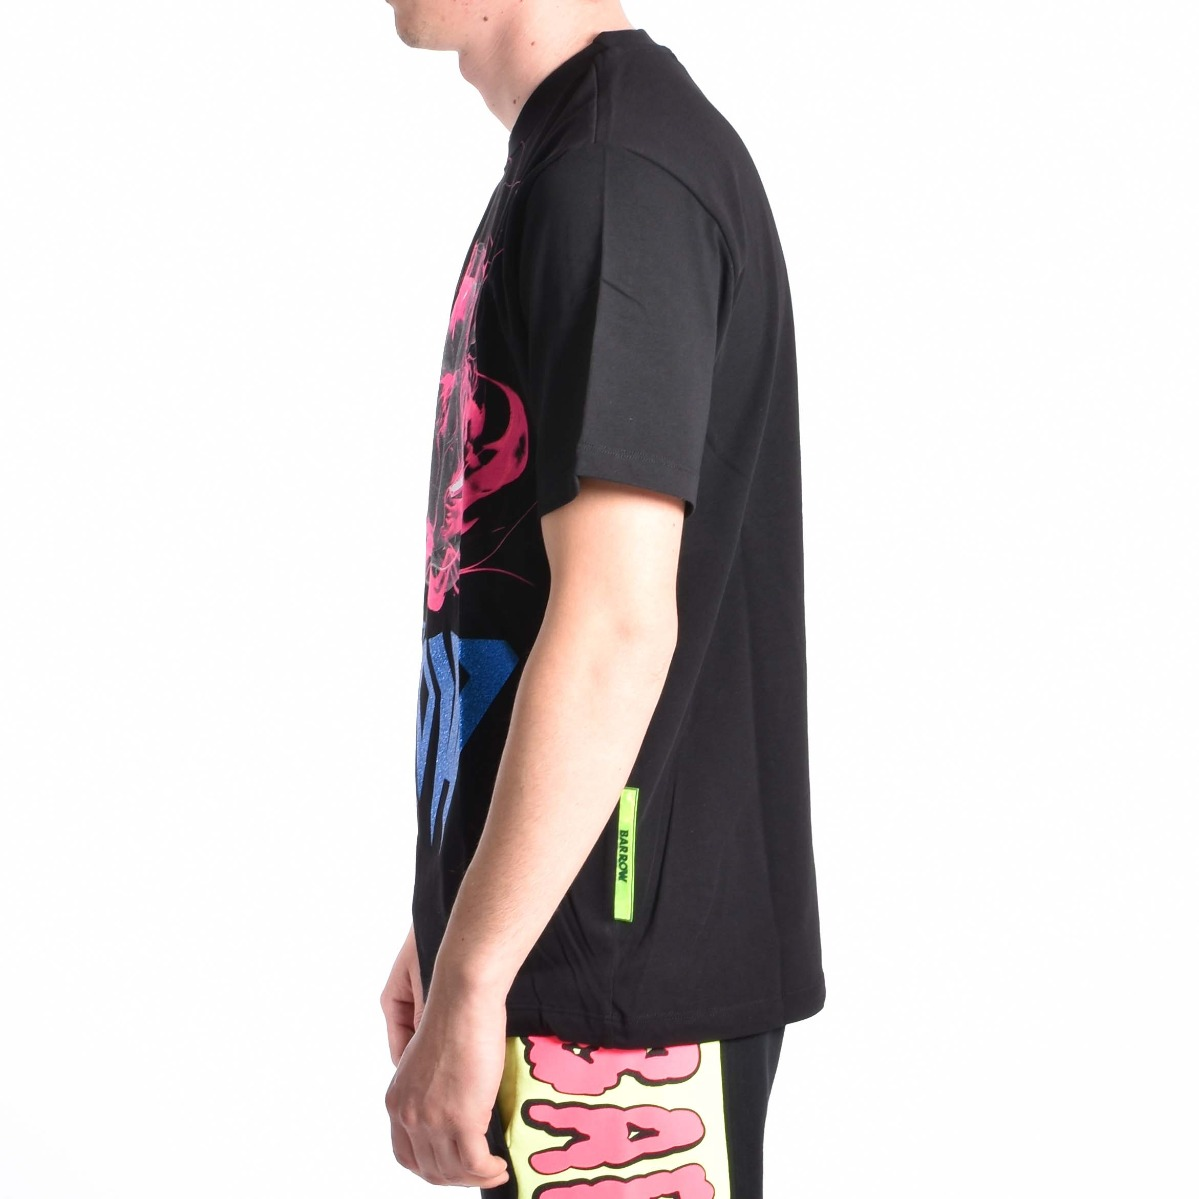 T-shirt Lamborghini infiammata - Nero/fuxia